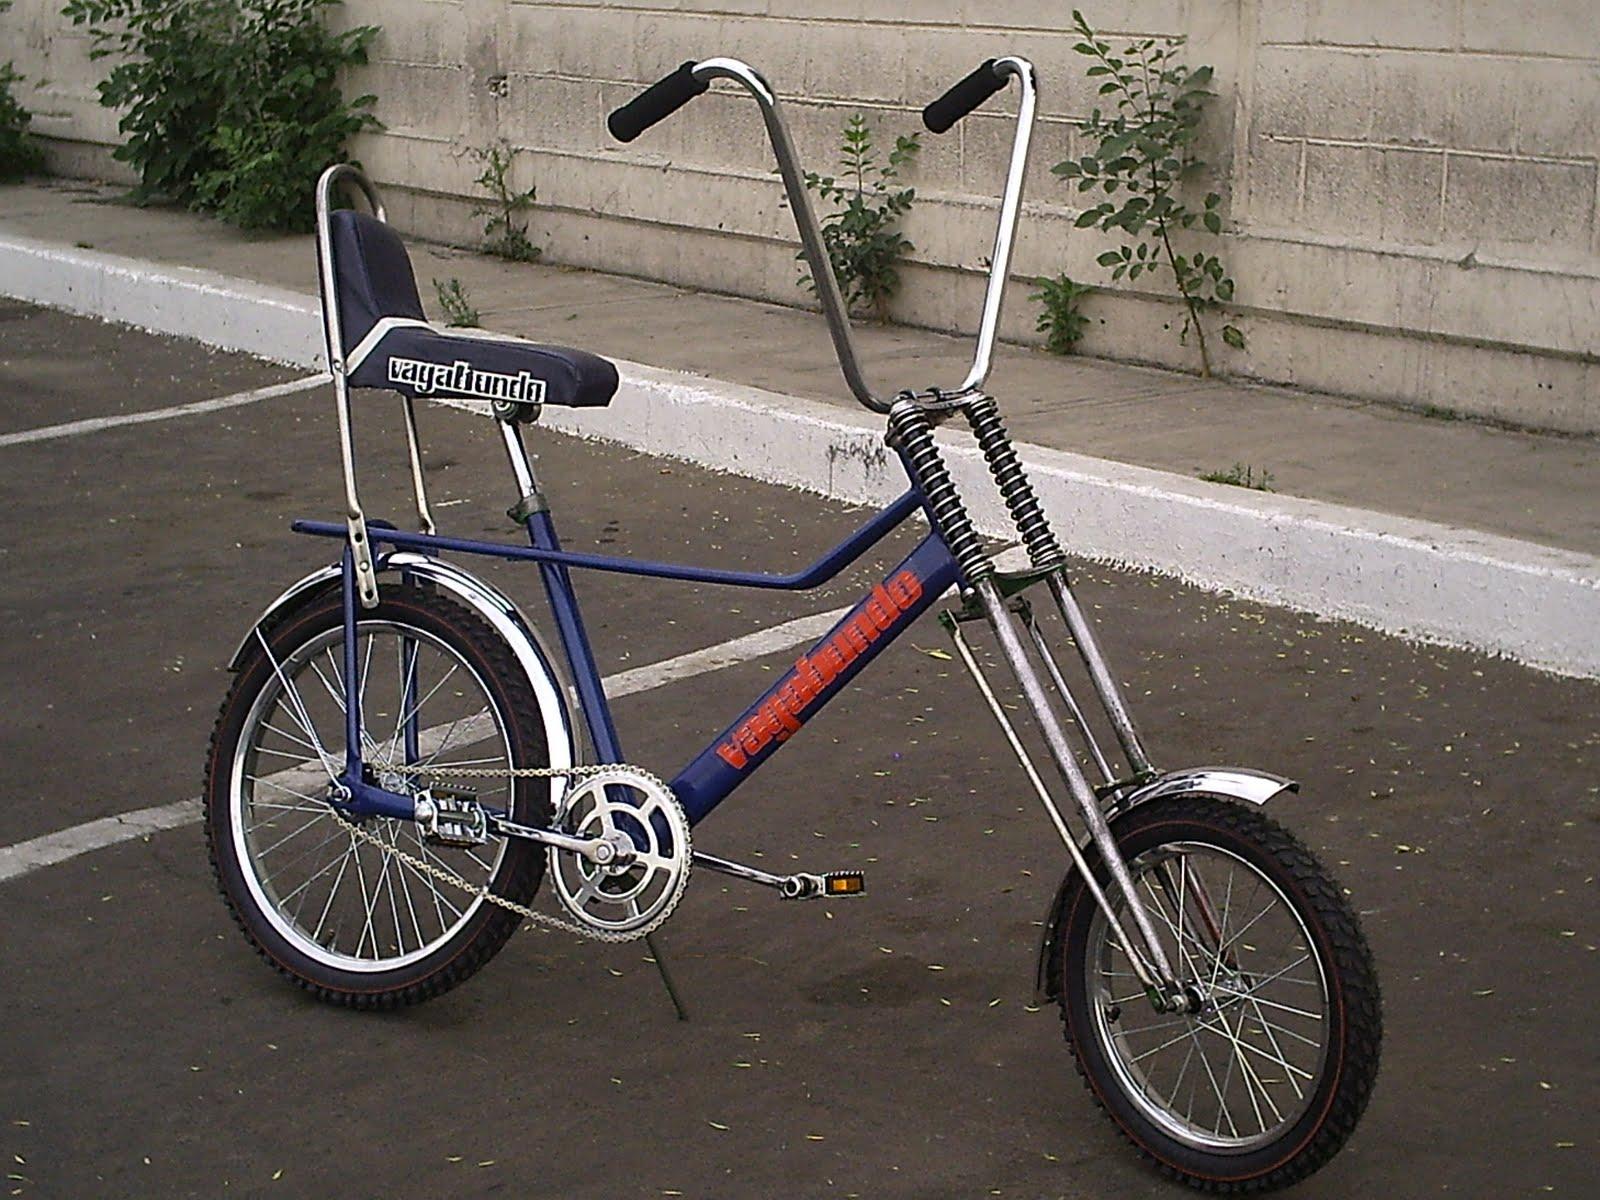 Ni Bicicleta Ni Bicicleto: MINAA BIKES CUSTOMS: Julio 2010